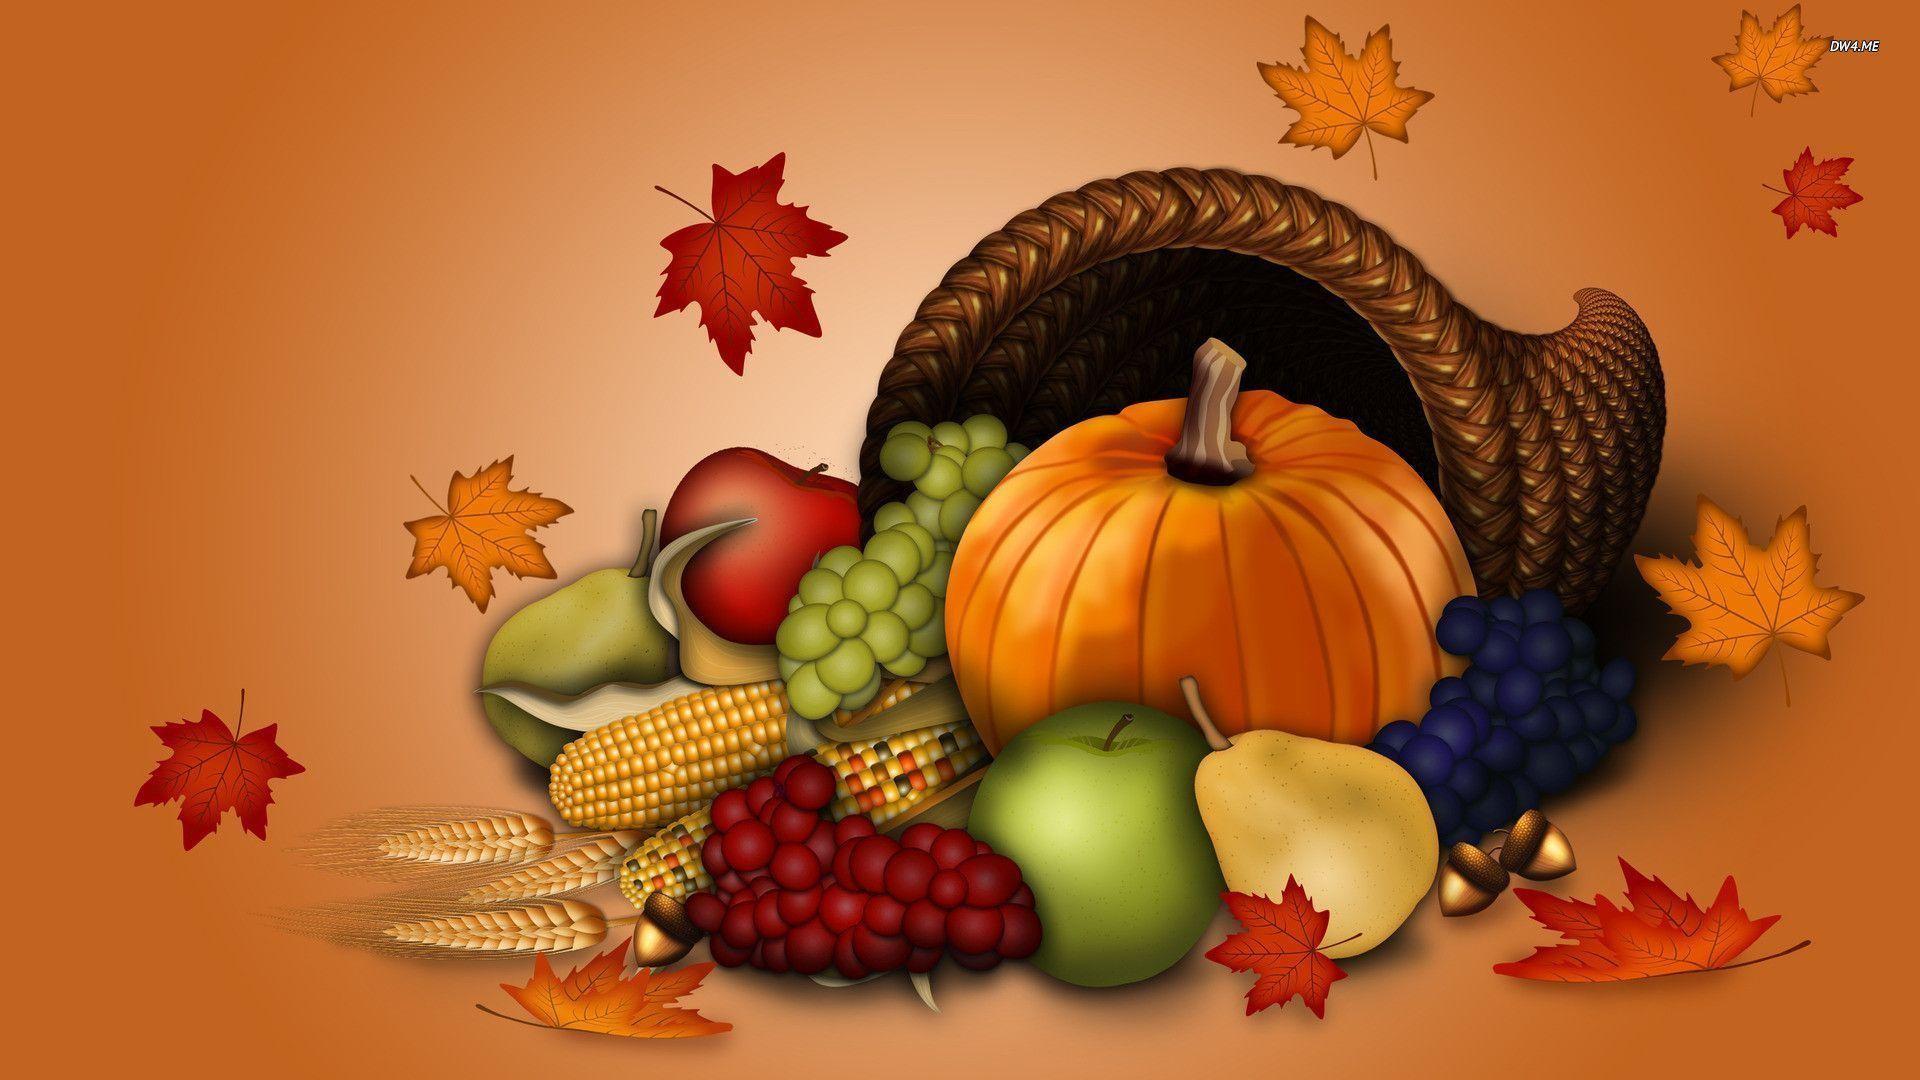 Thanksgiving Desktop HD Wallpaper Desktop – Beraplan.